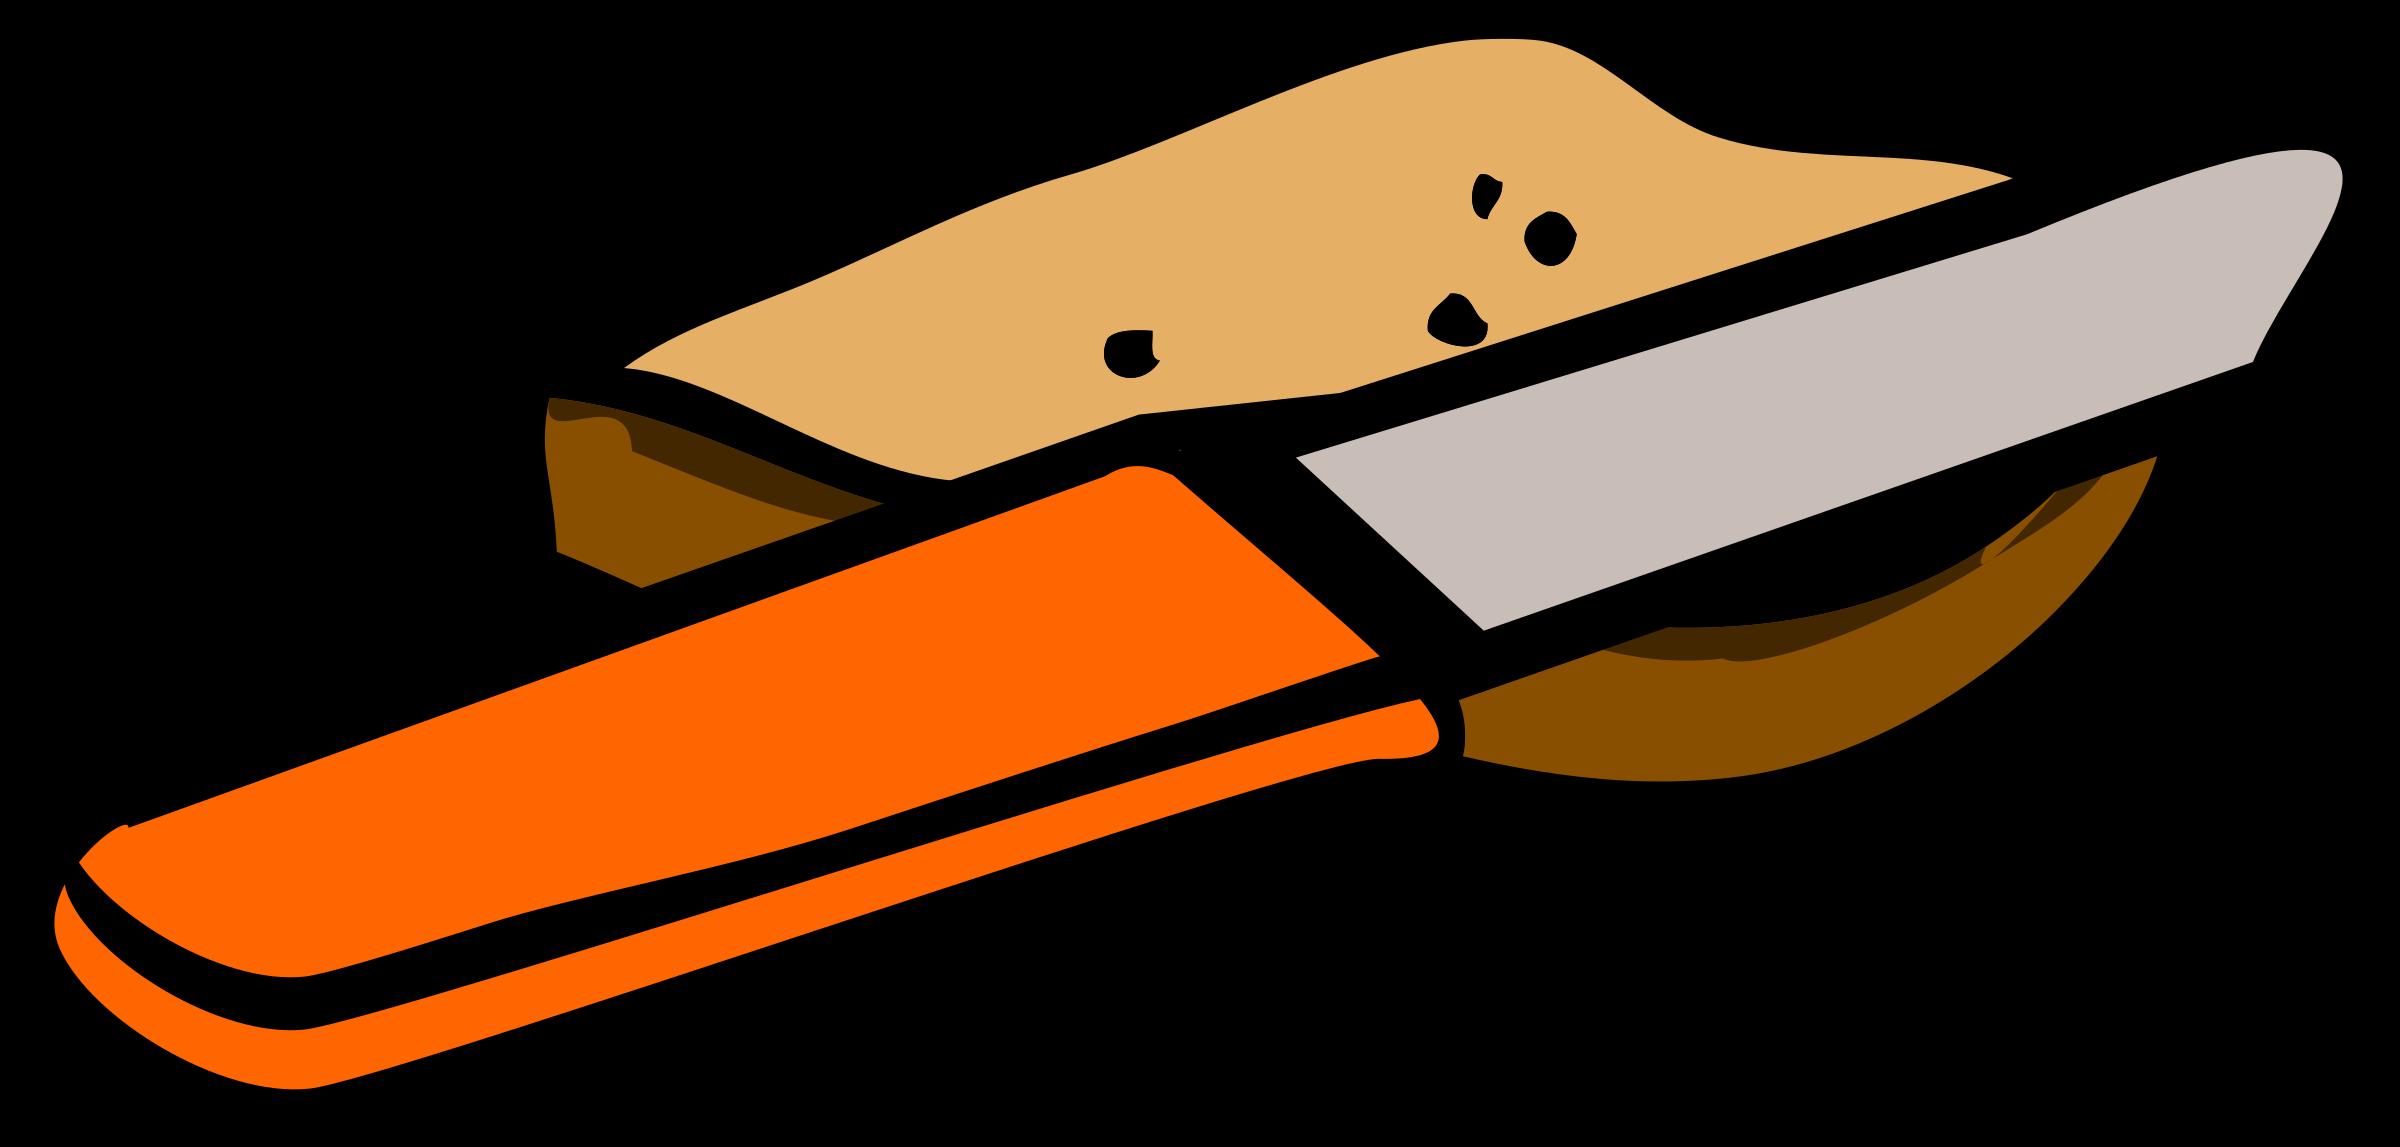 Khife clipart orange And knife bread of bread